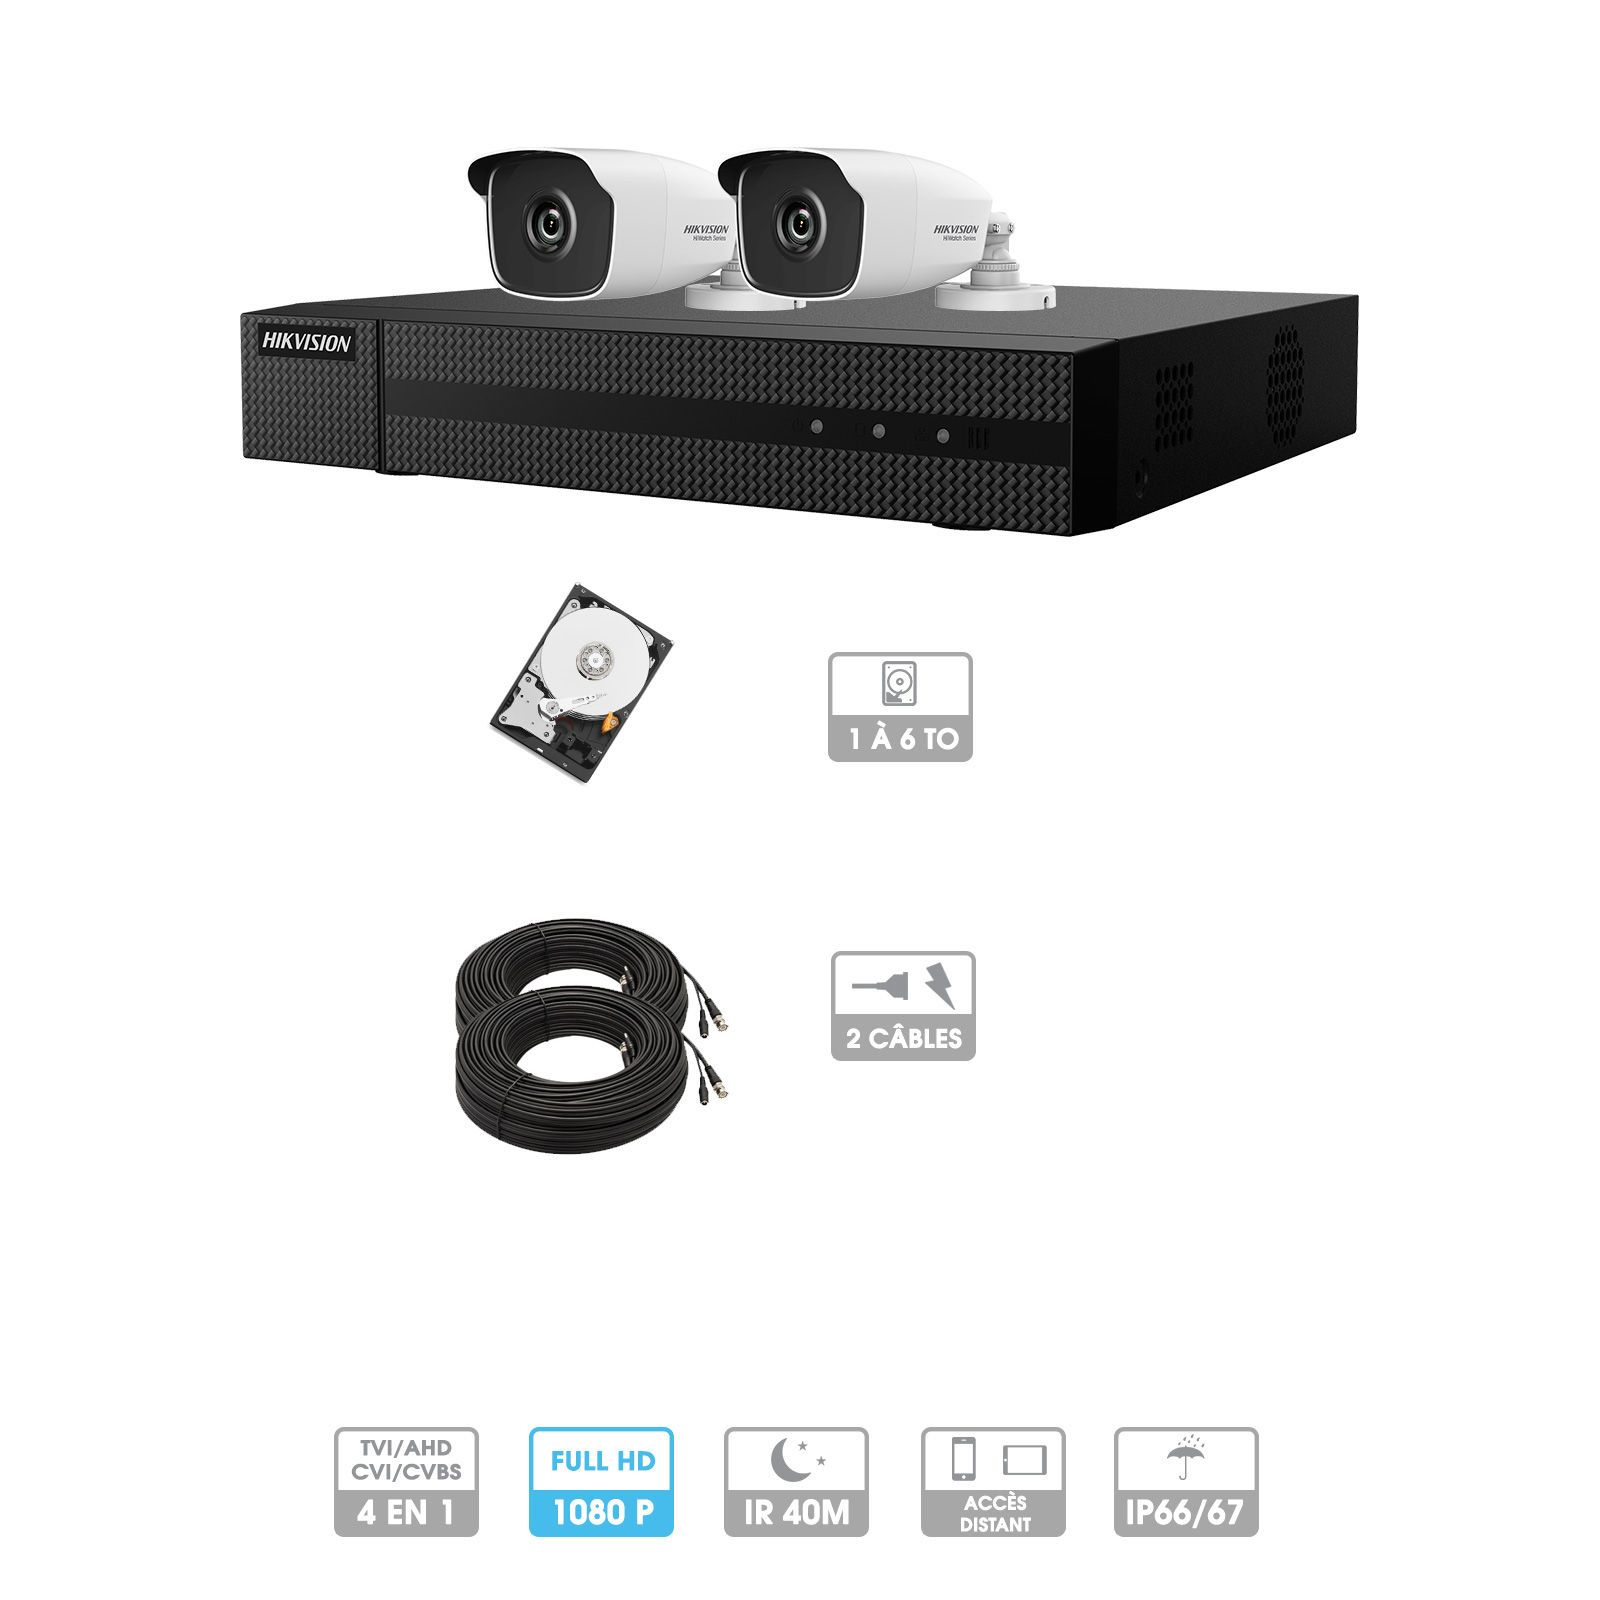 Kit vidéosurveillance 2 caméras 1080P HD | 2 câbles 20 mètres | HDD 1To | Tubes Hiwatch